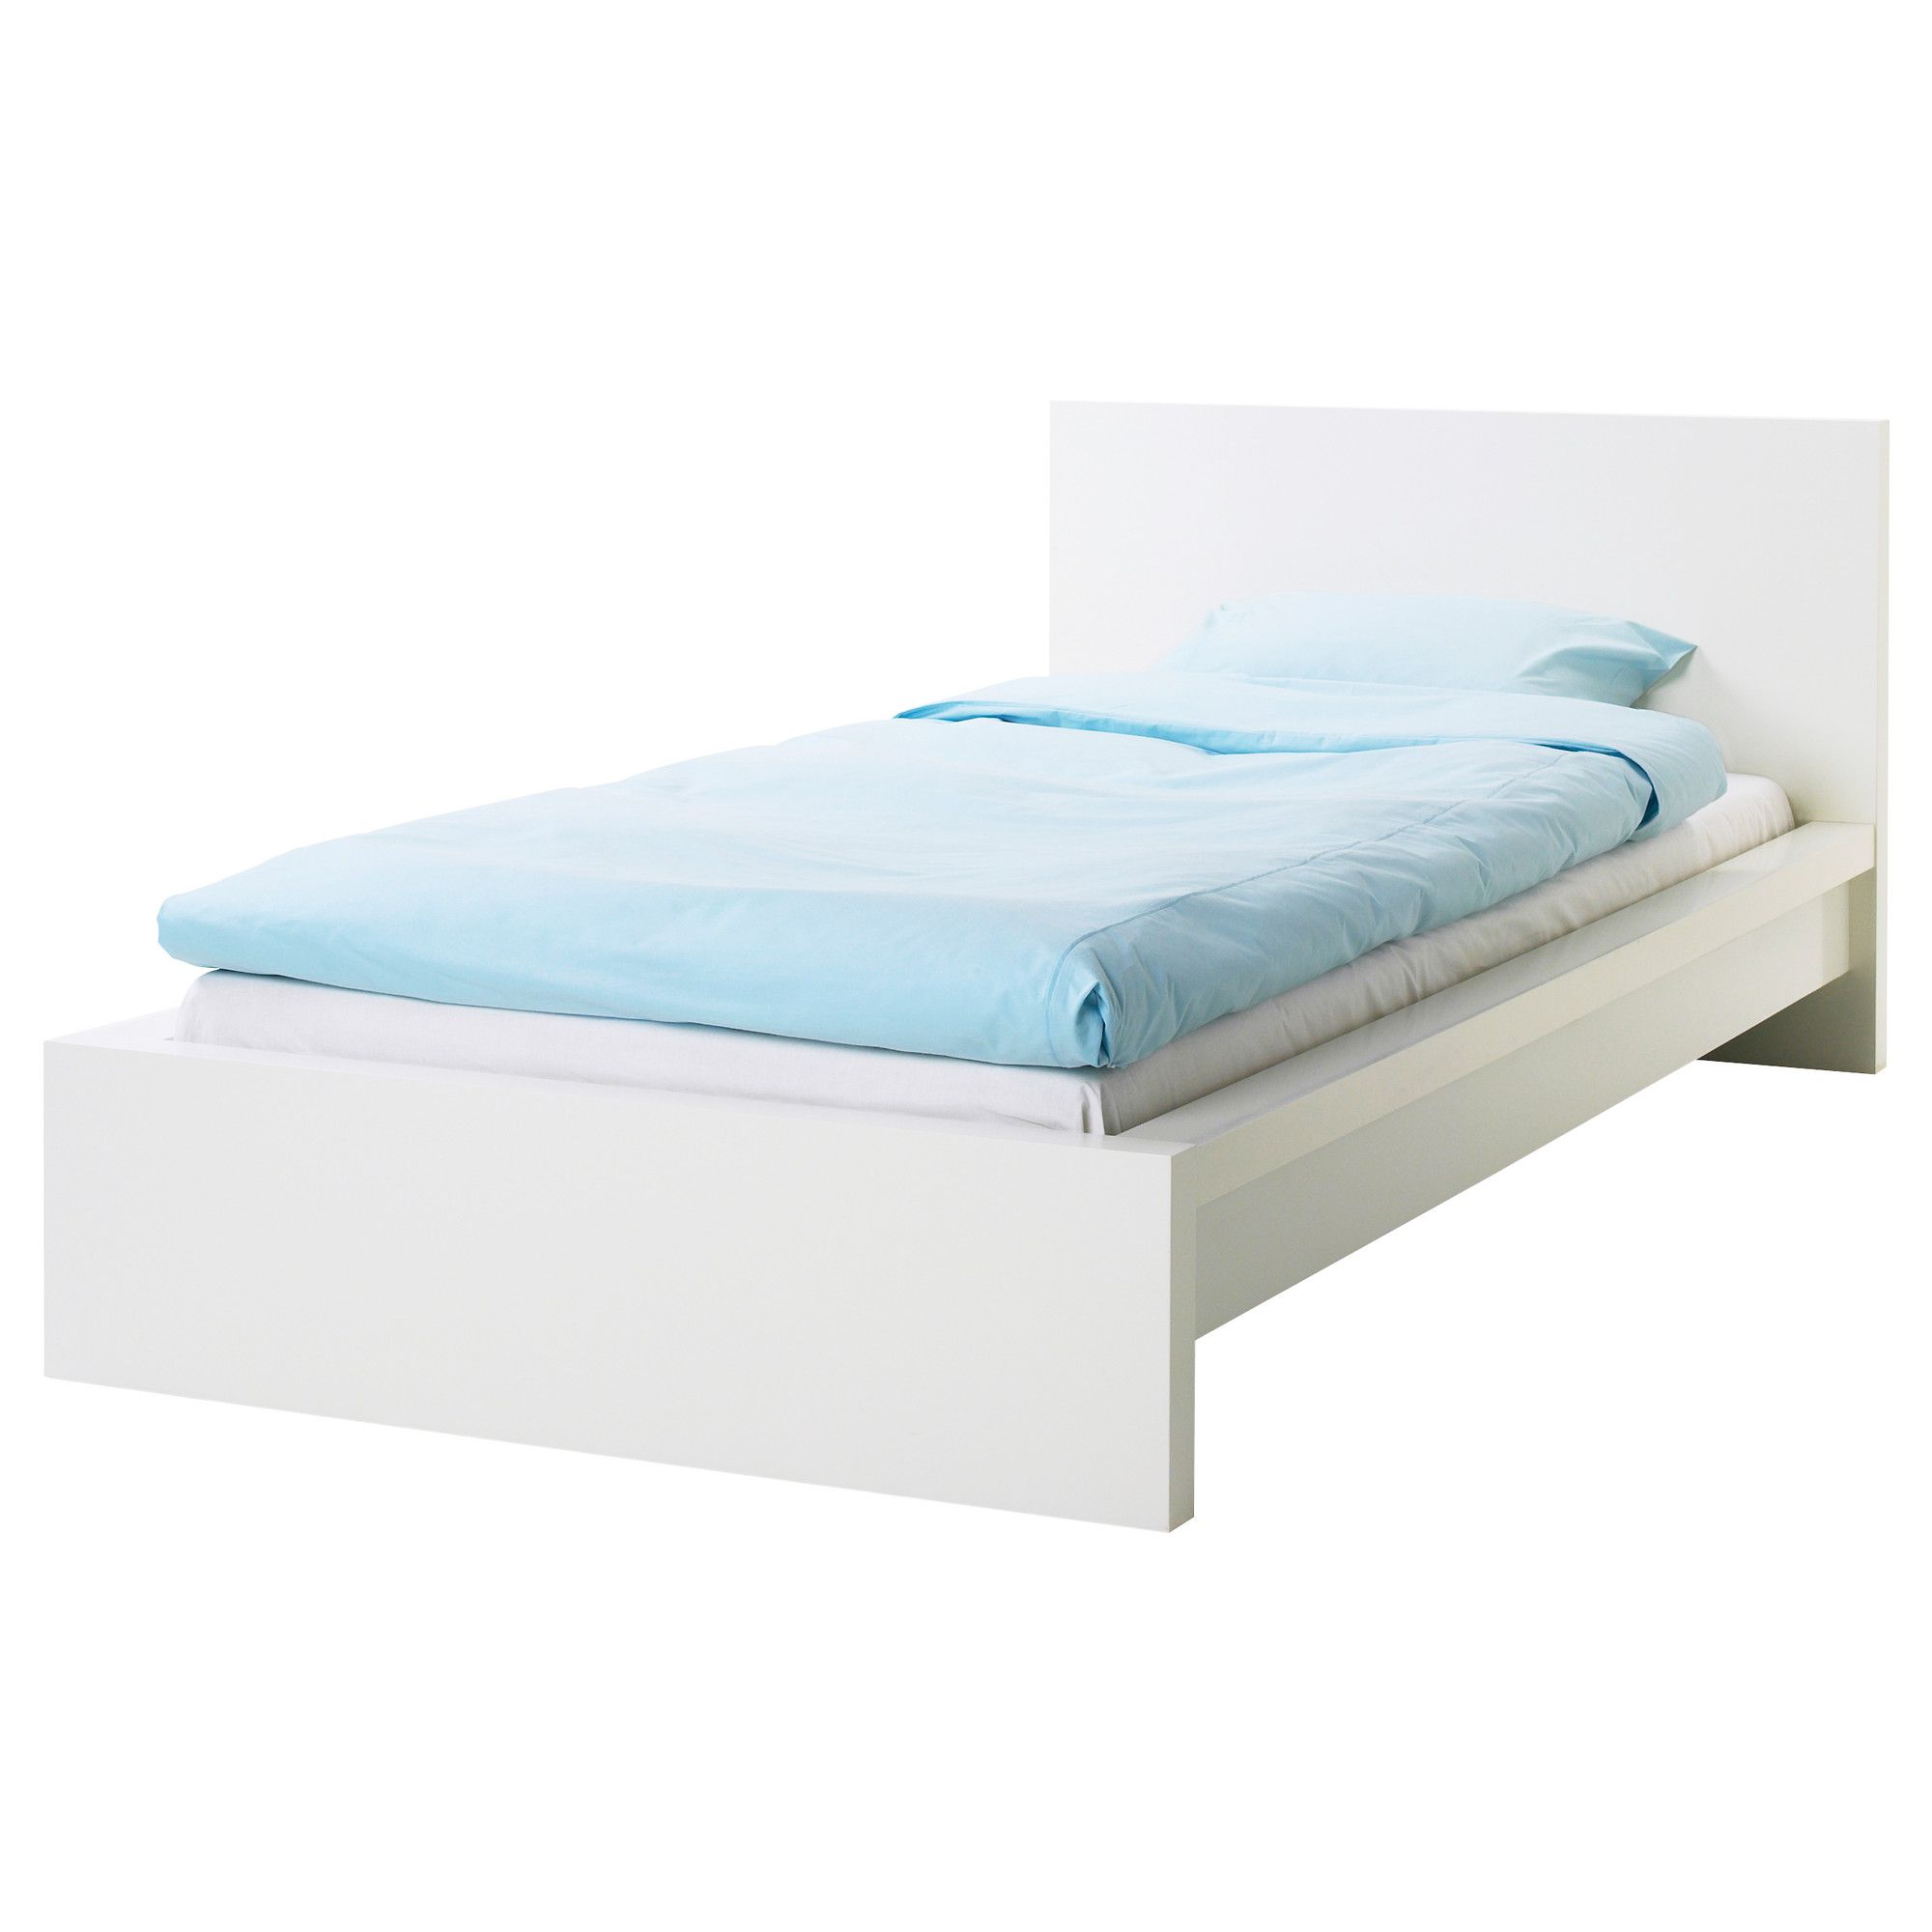 Fresh Home Furnishing Ideas And Affordable Furniture Lit Malm Lit Ikea Cadre De Lit Malm